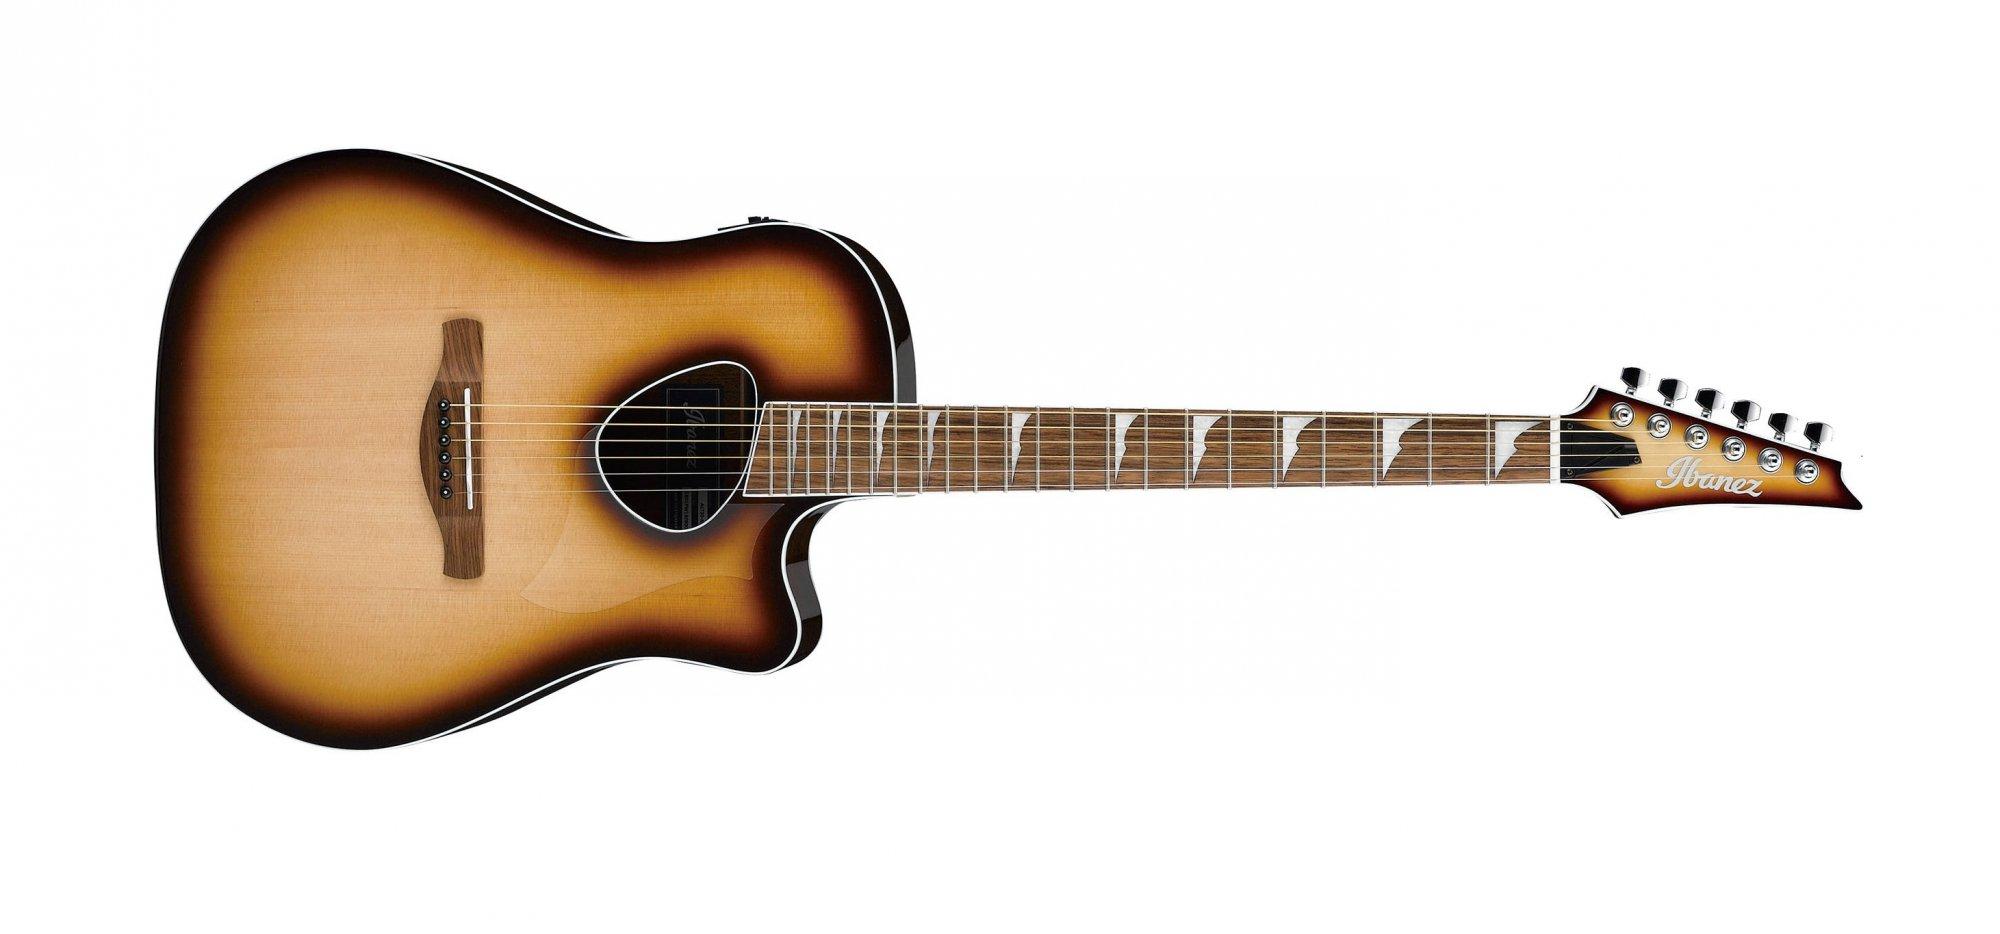 Ibanez Altstar ALT30 Acoustic Electric Guitar, Natural Browned Burst